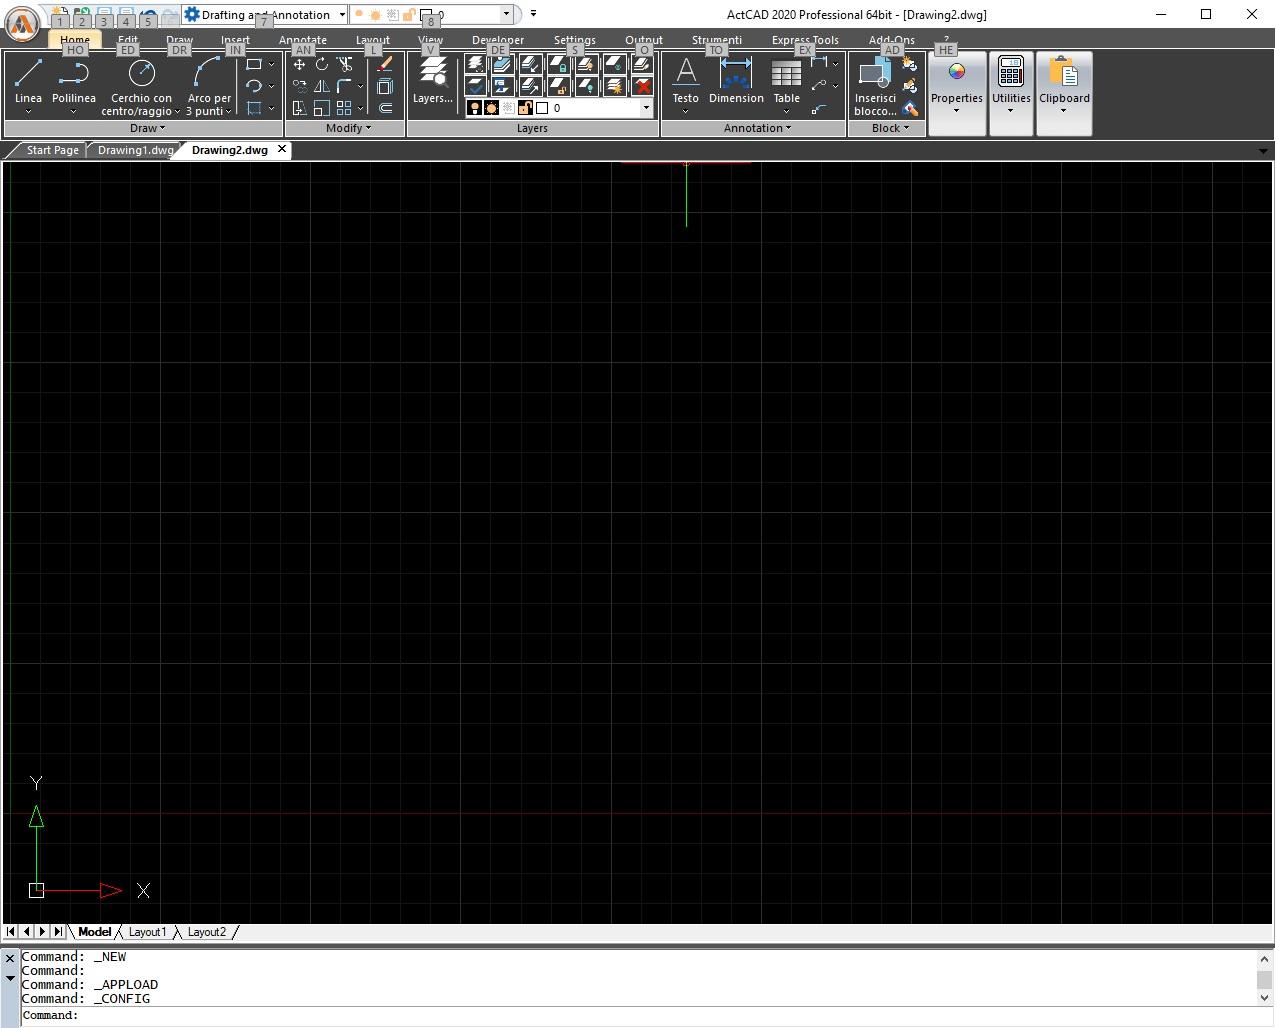 ActCAD Professional 2020 v9.2.690 x64 - ITA